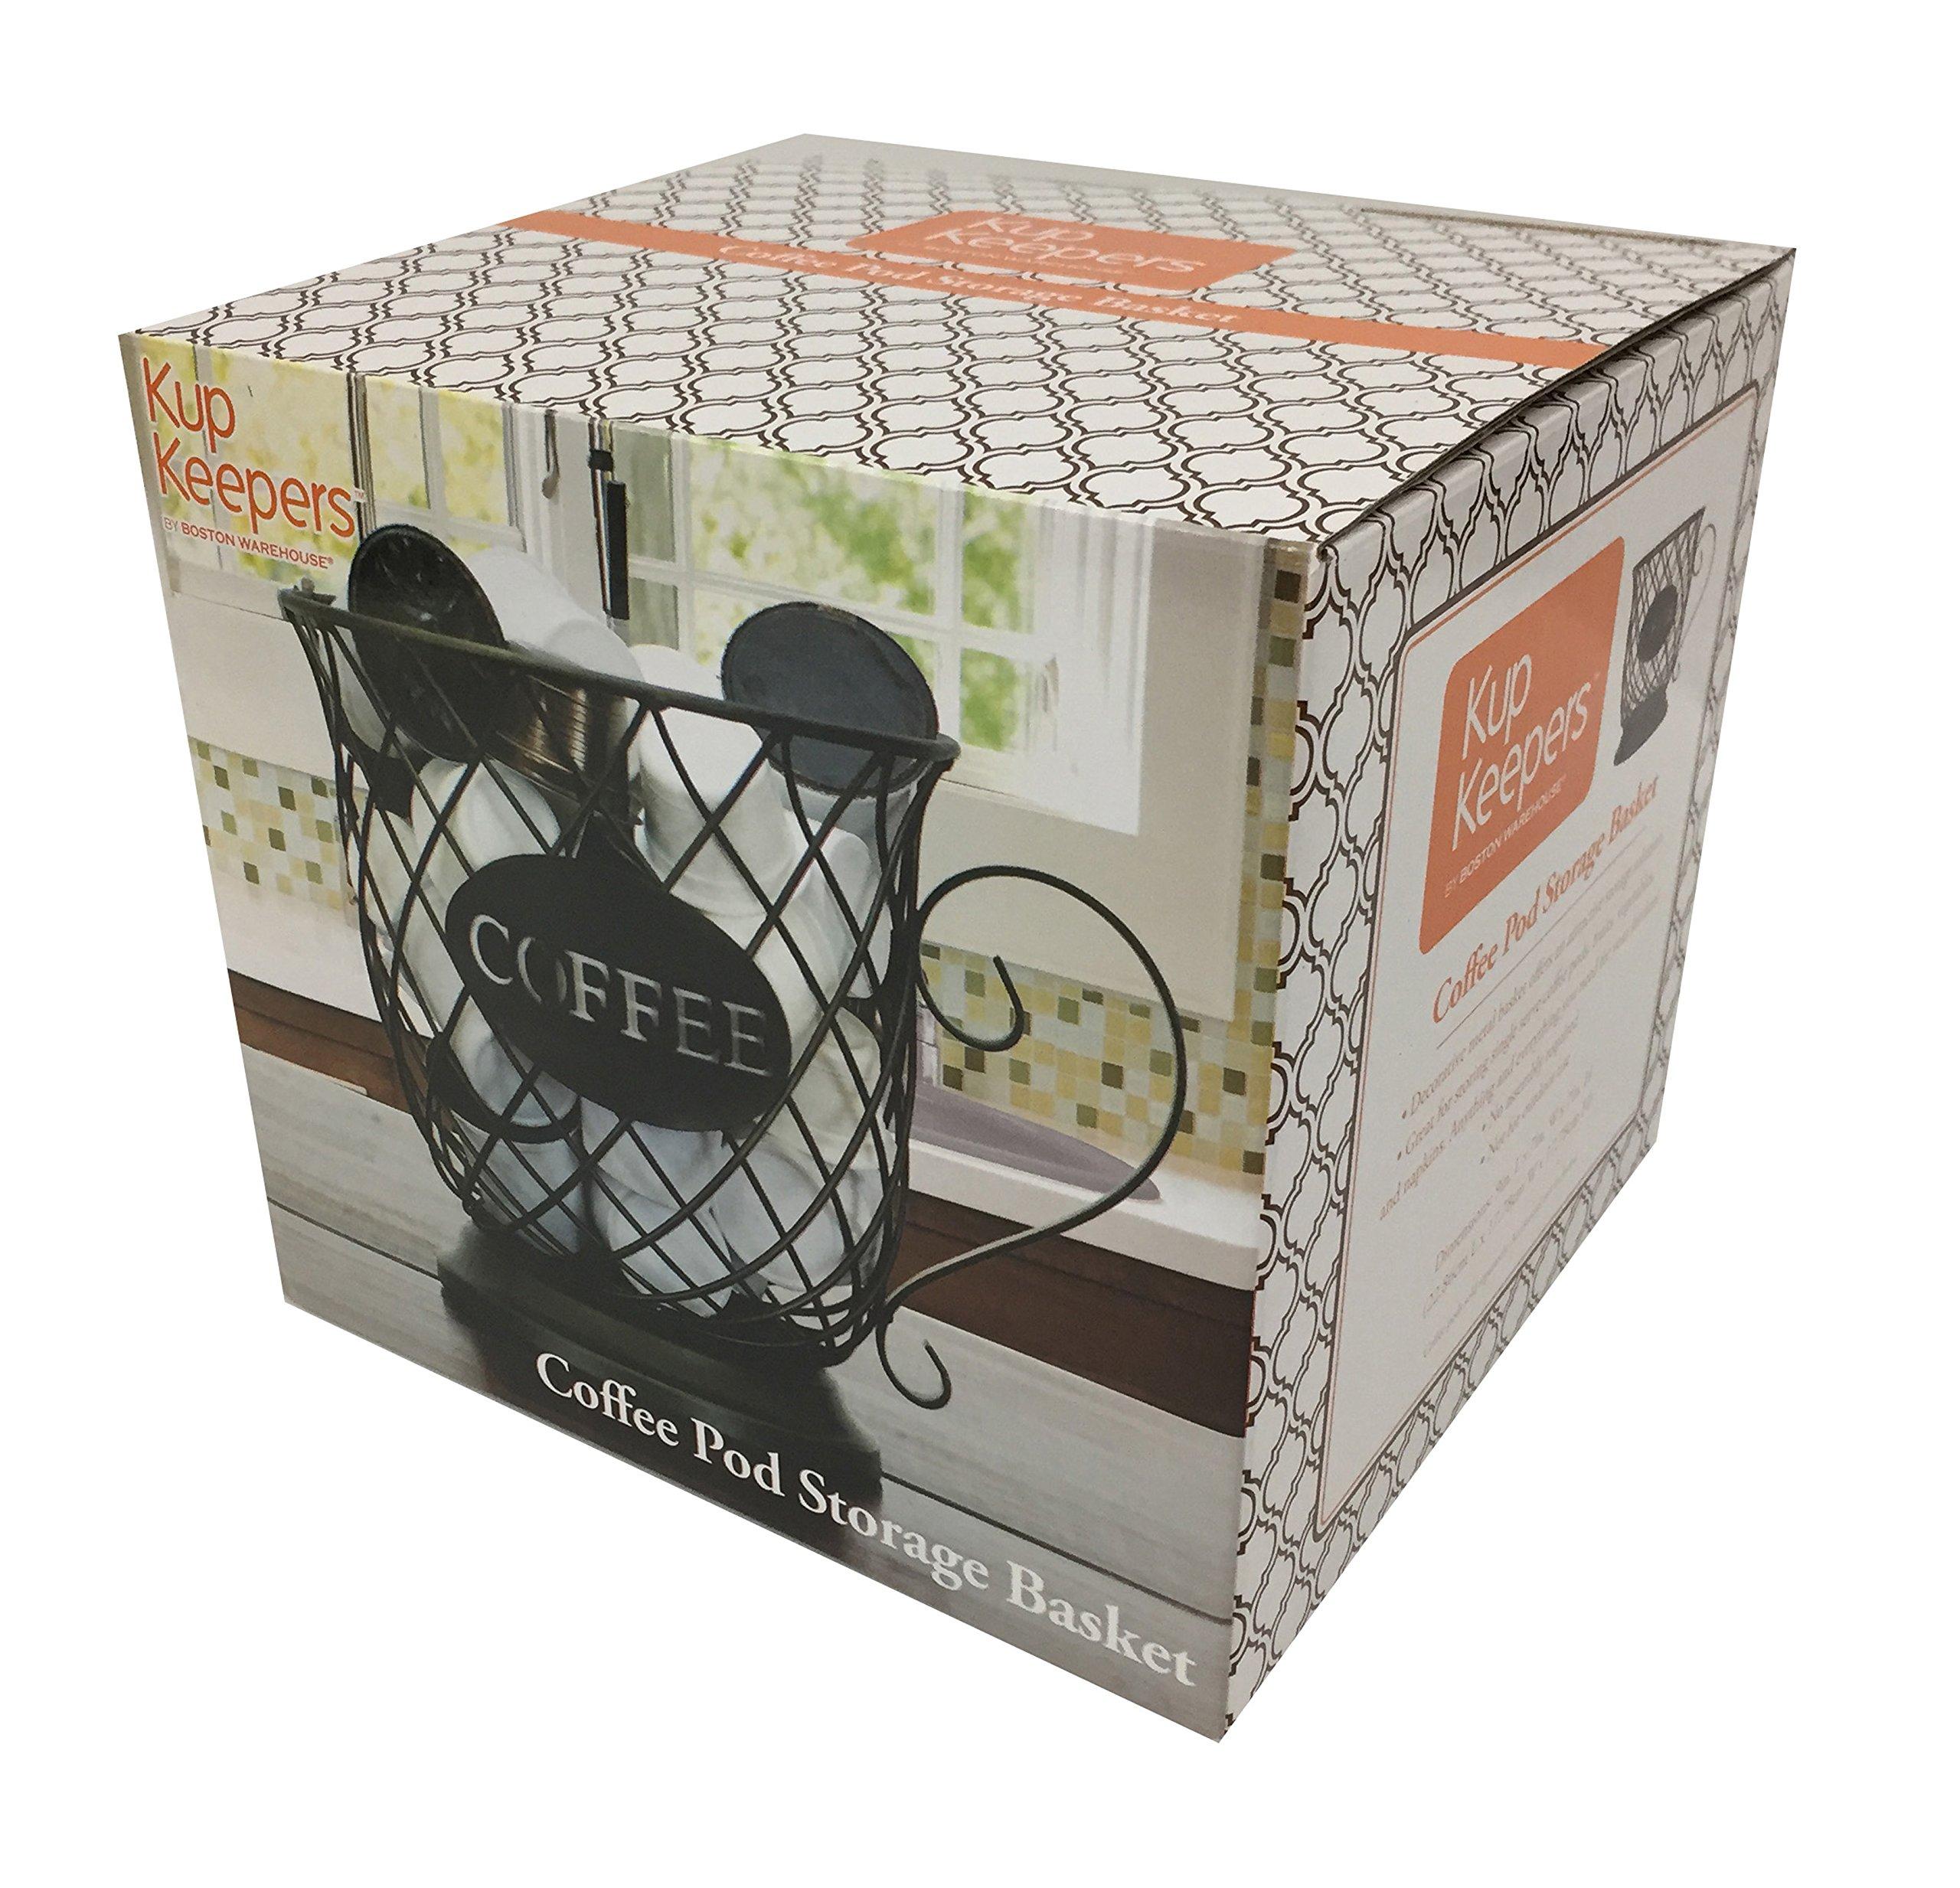 Kup Keeper Coffee & Espresso Pod Holder, Coffee Mug Storage Basket by Boston Warehouse by Boston Warehouse (Image #6)